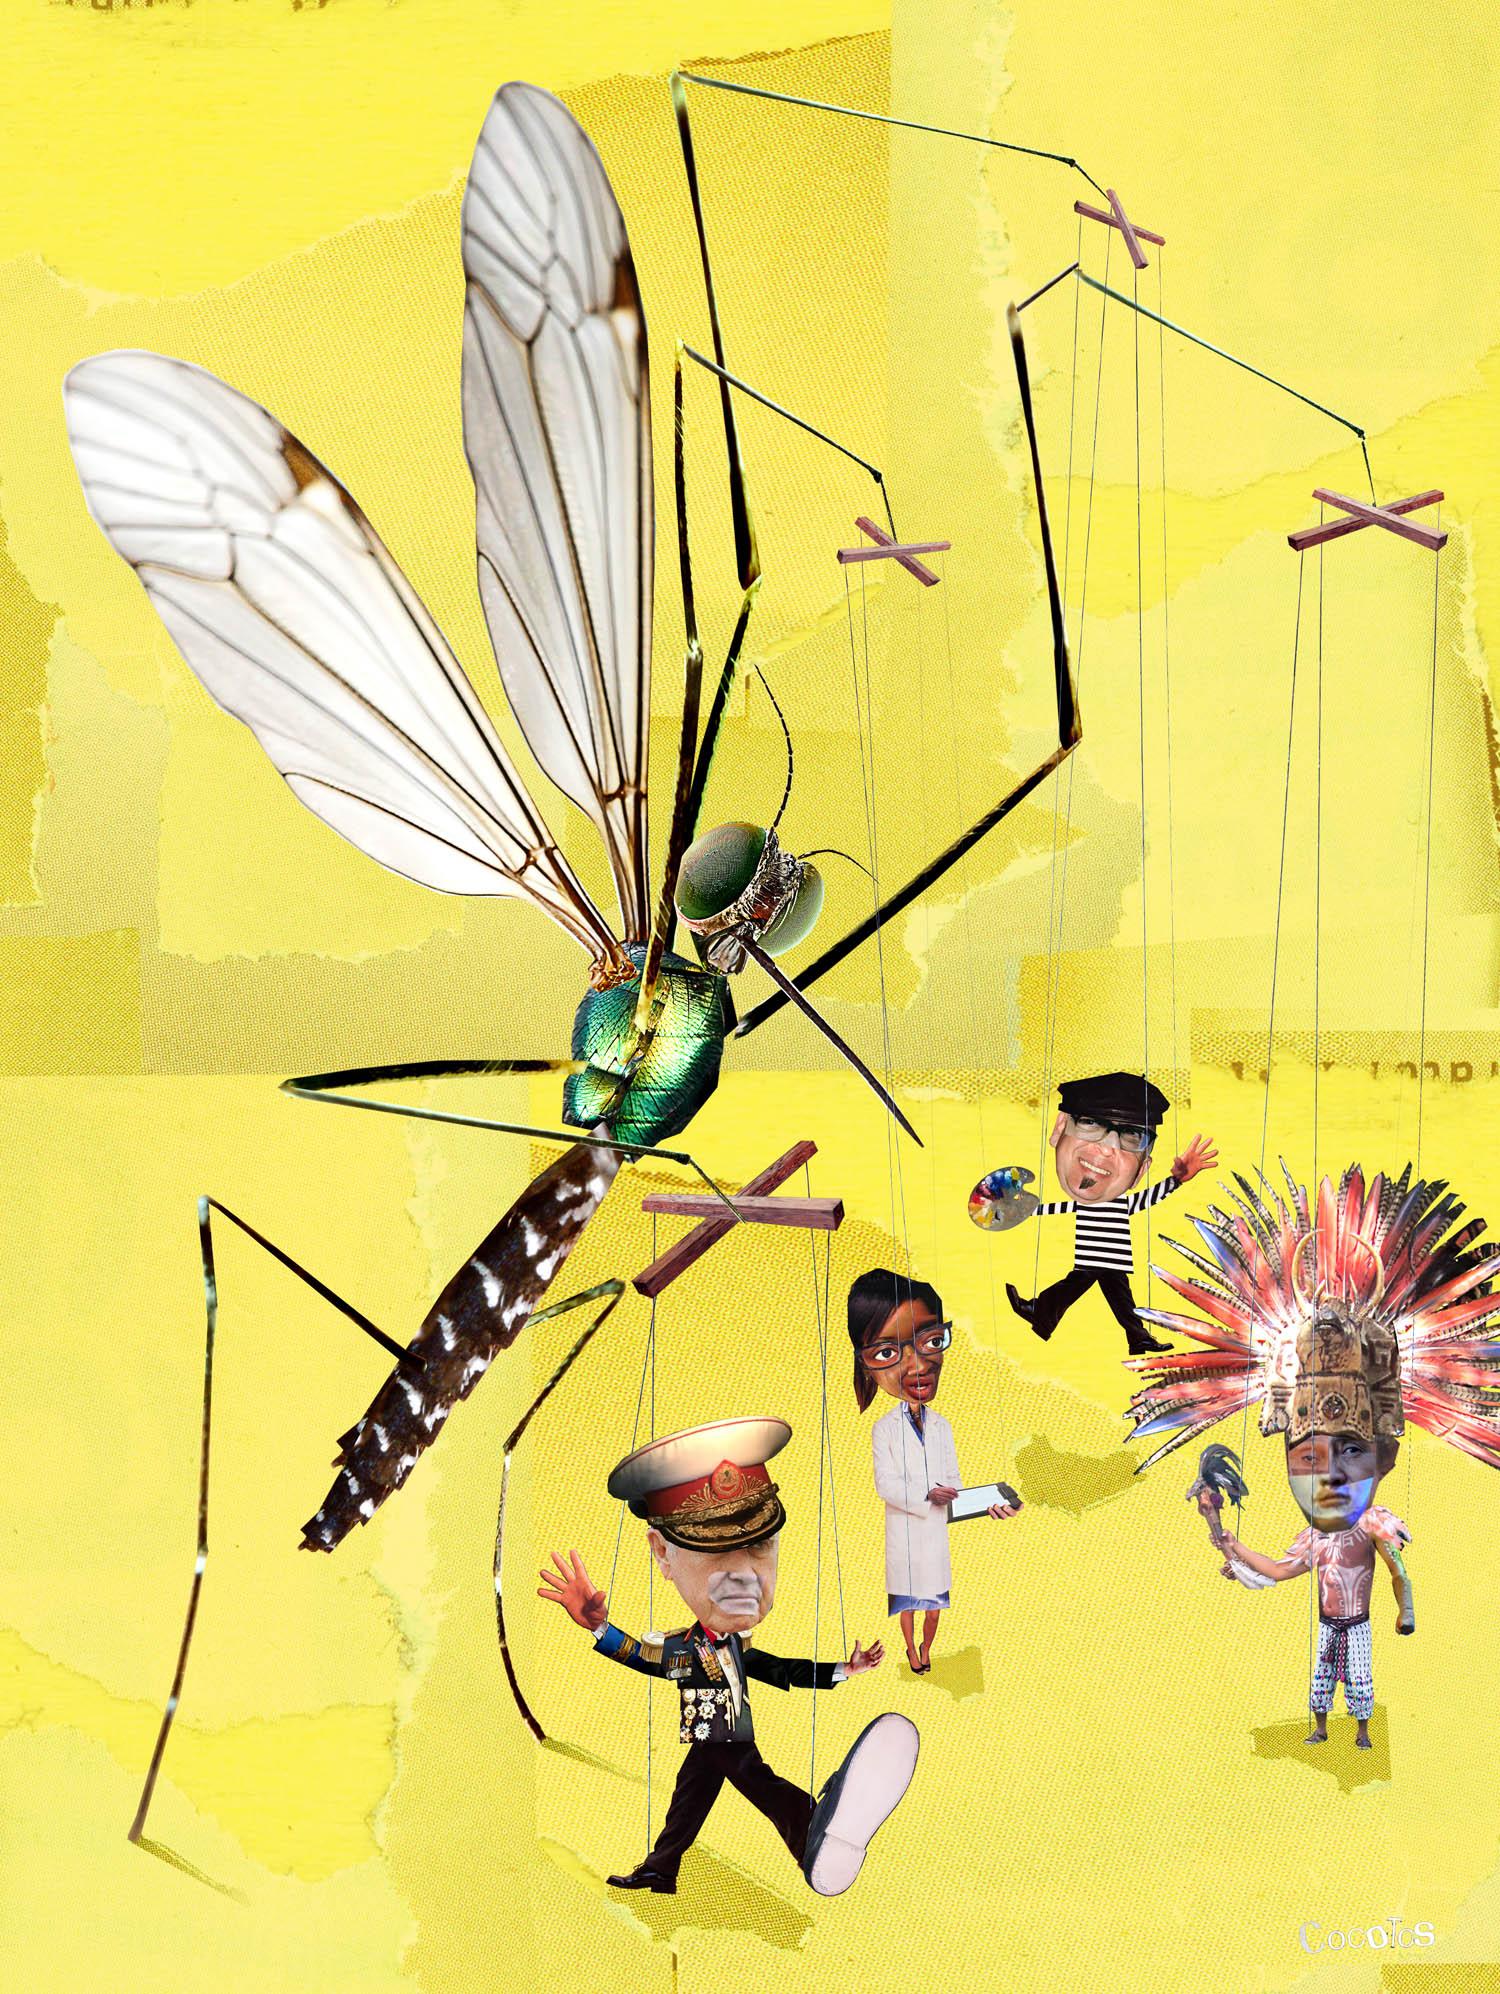 011401-mosquito copy.jpg